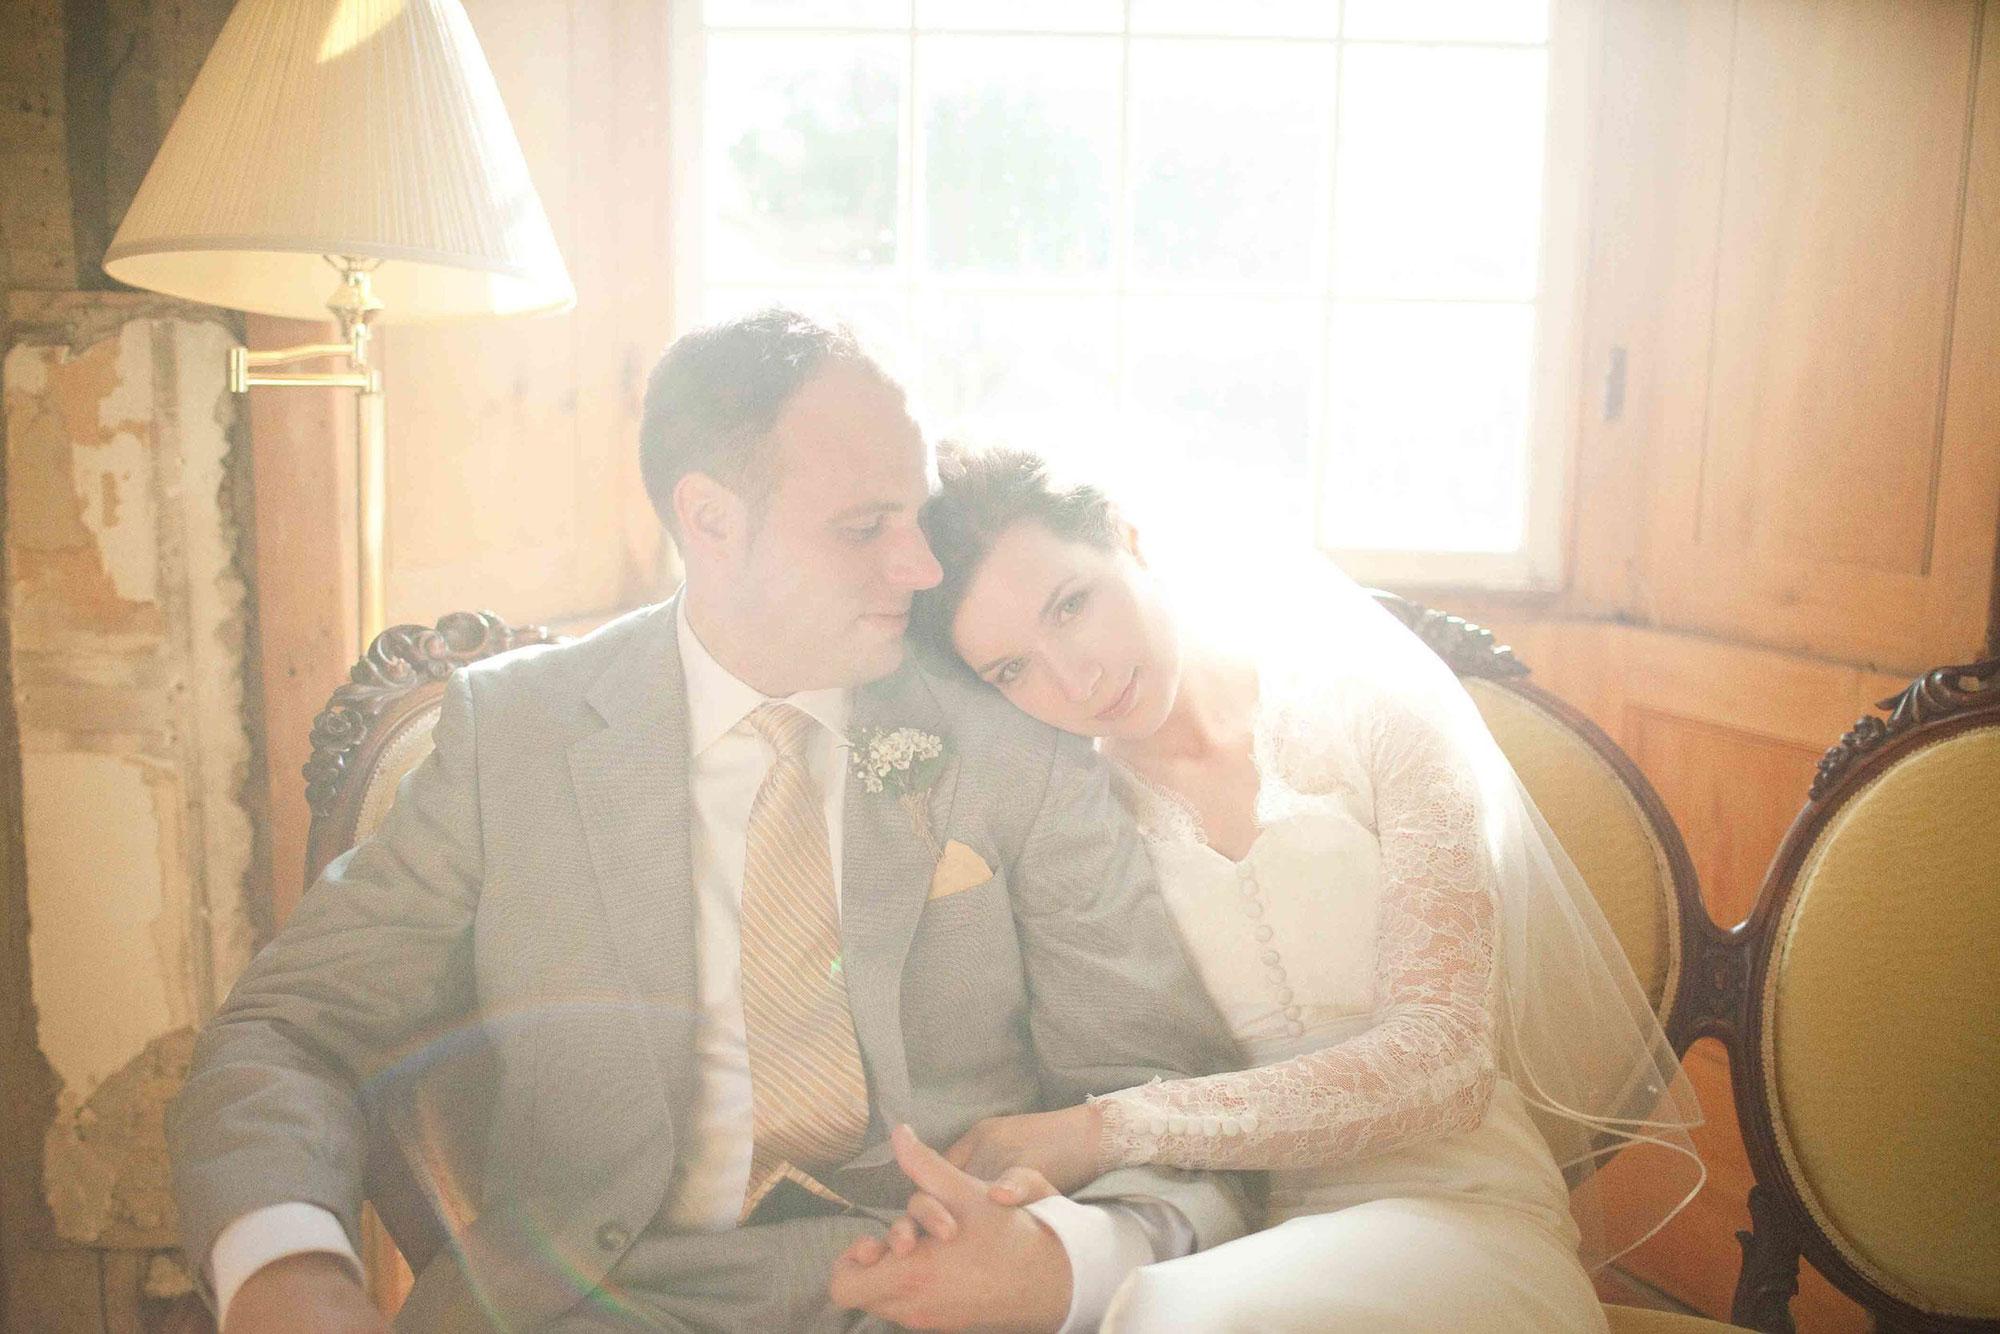 Amanda-Cowley-Willowbank-Vineyard-Bride-Photo-By-White-Photographie-041.jpg